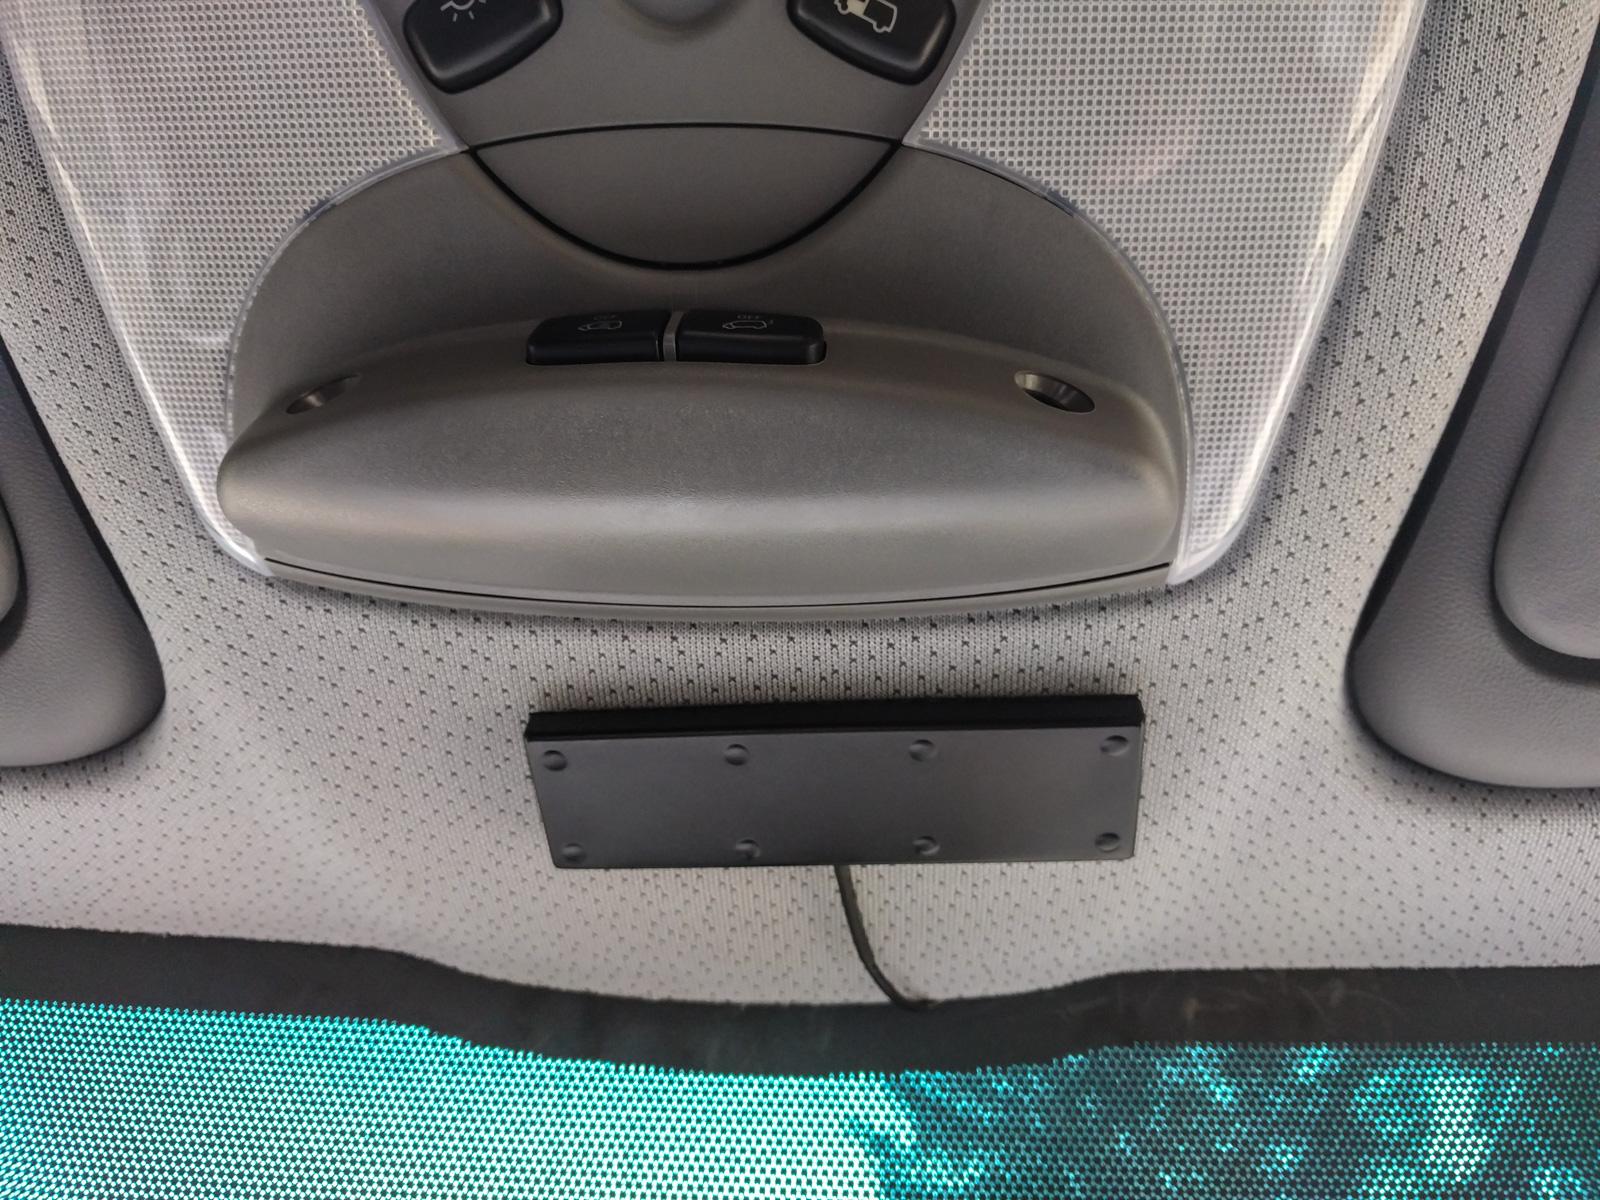 Cell phone signal booster – Sprinter Adventure Van